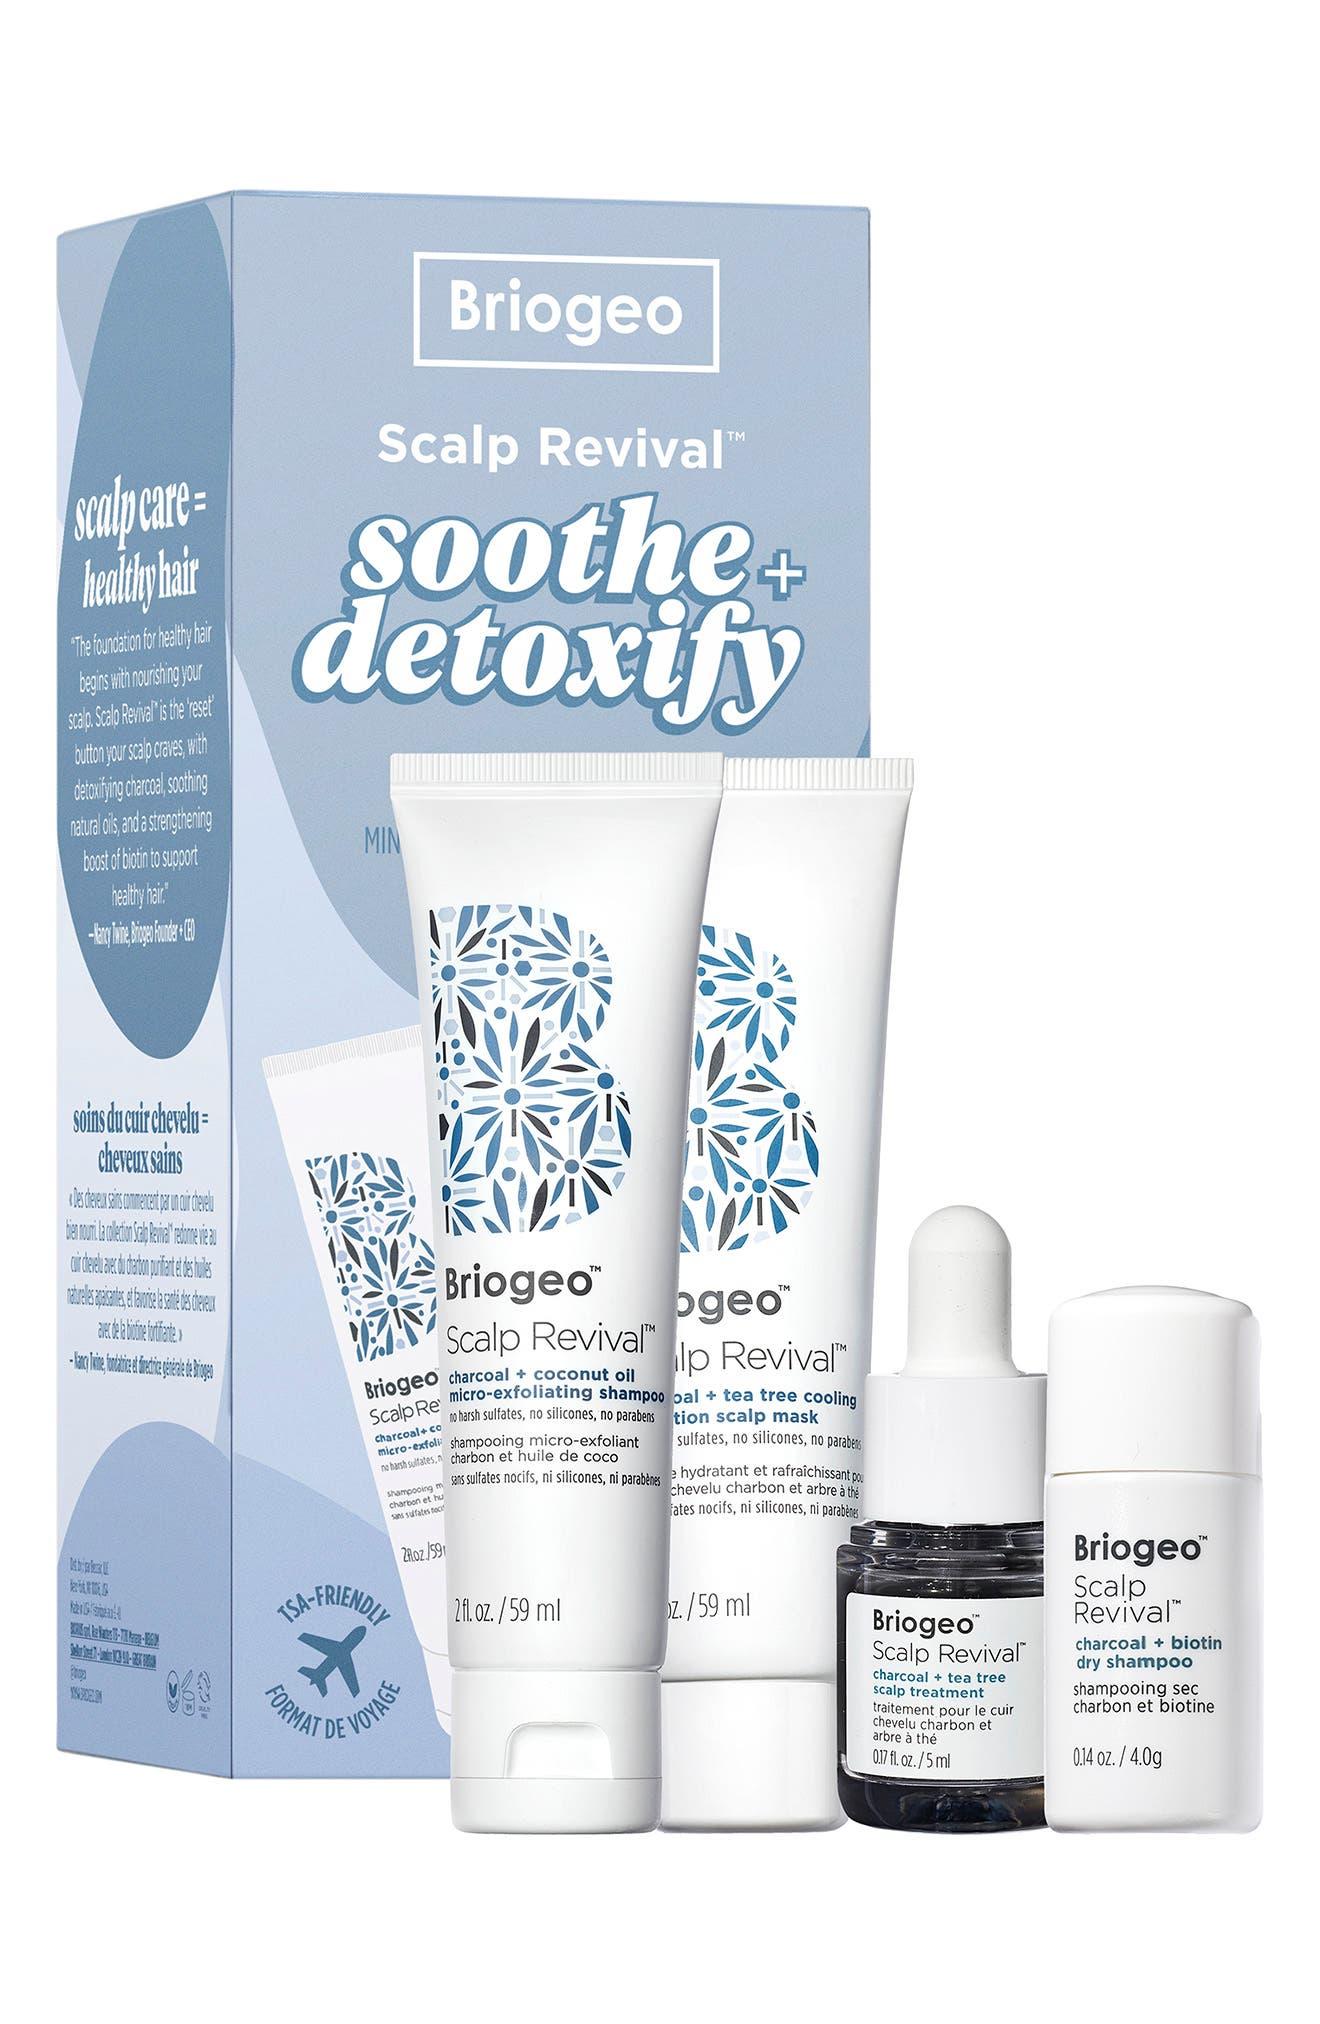 Scalp Revival(TM) Soothe & Detoxify Hair Care Set